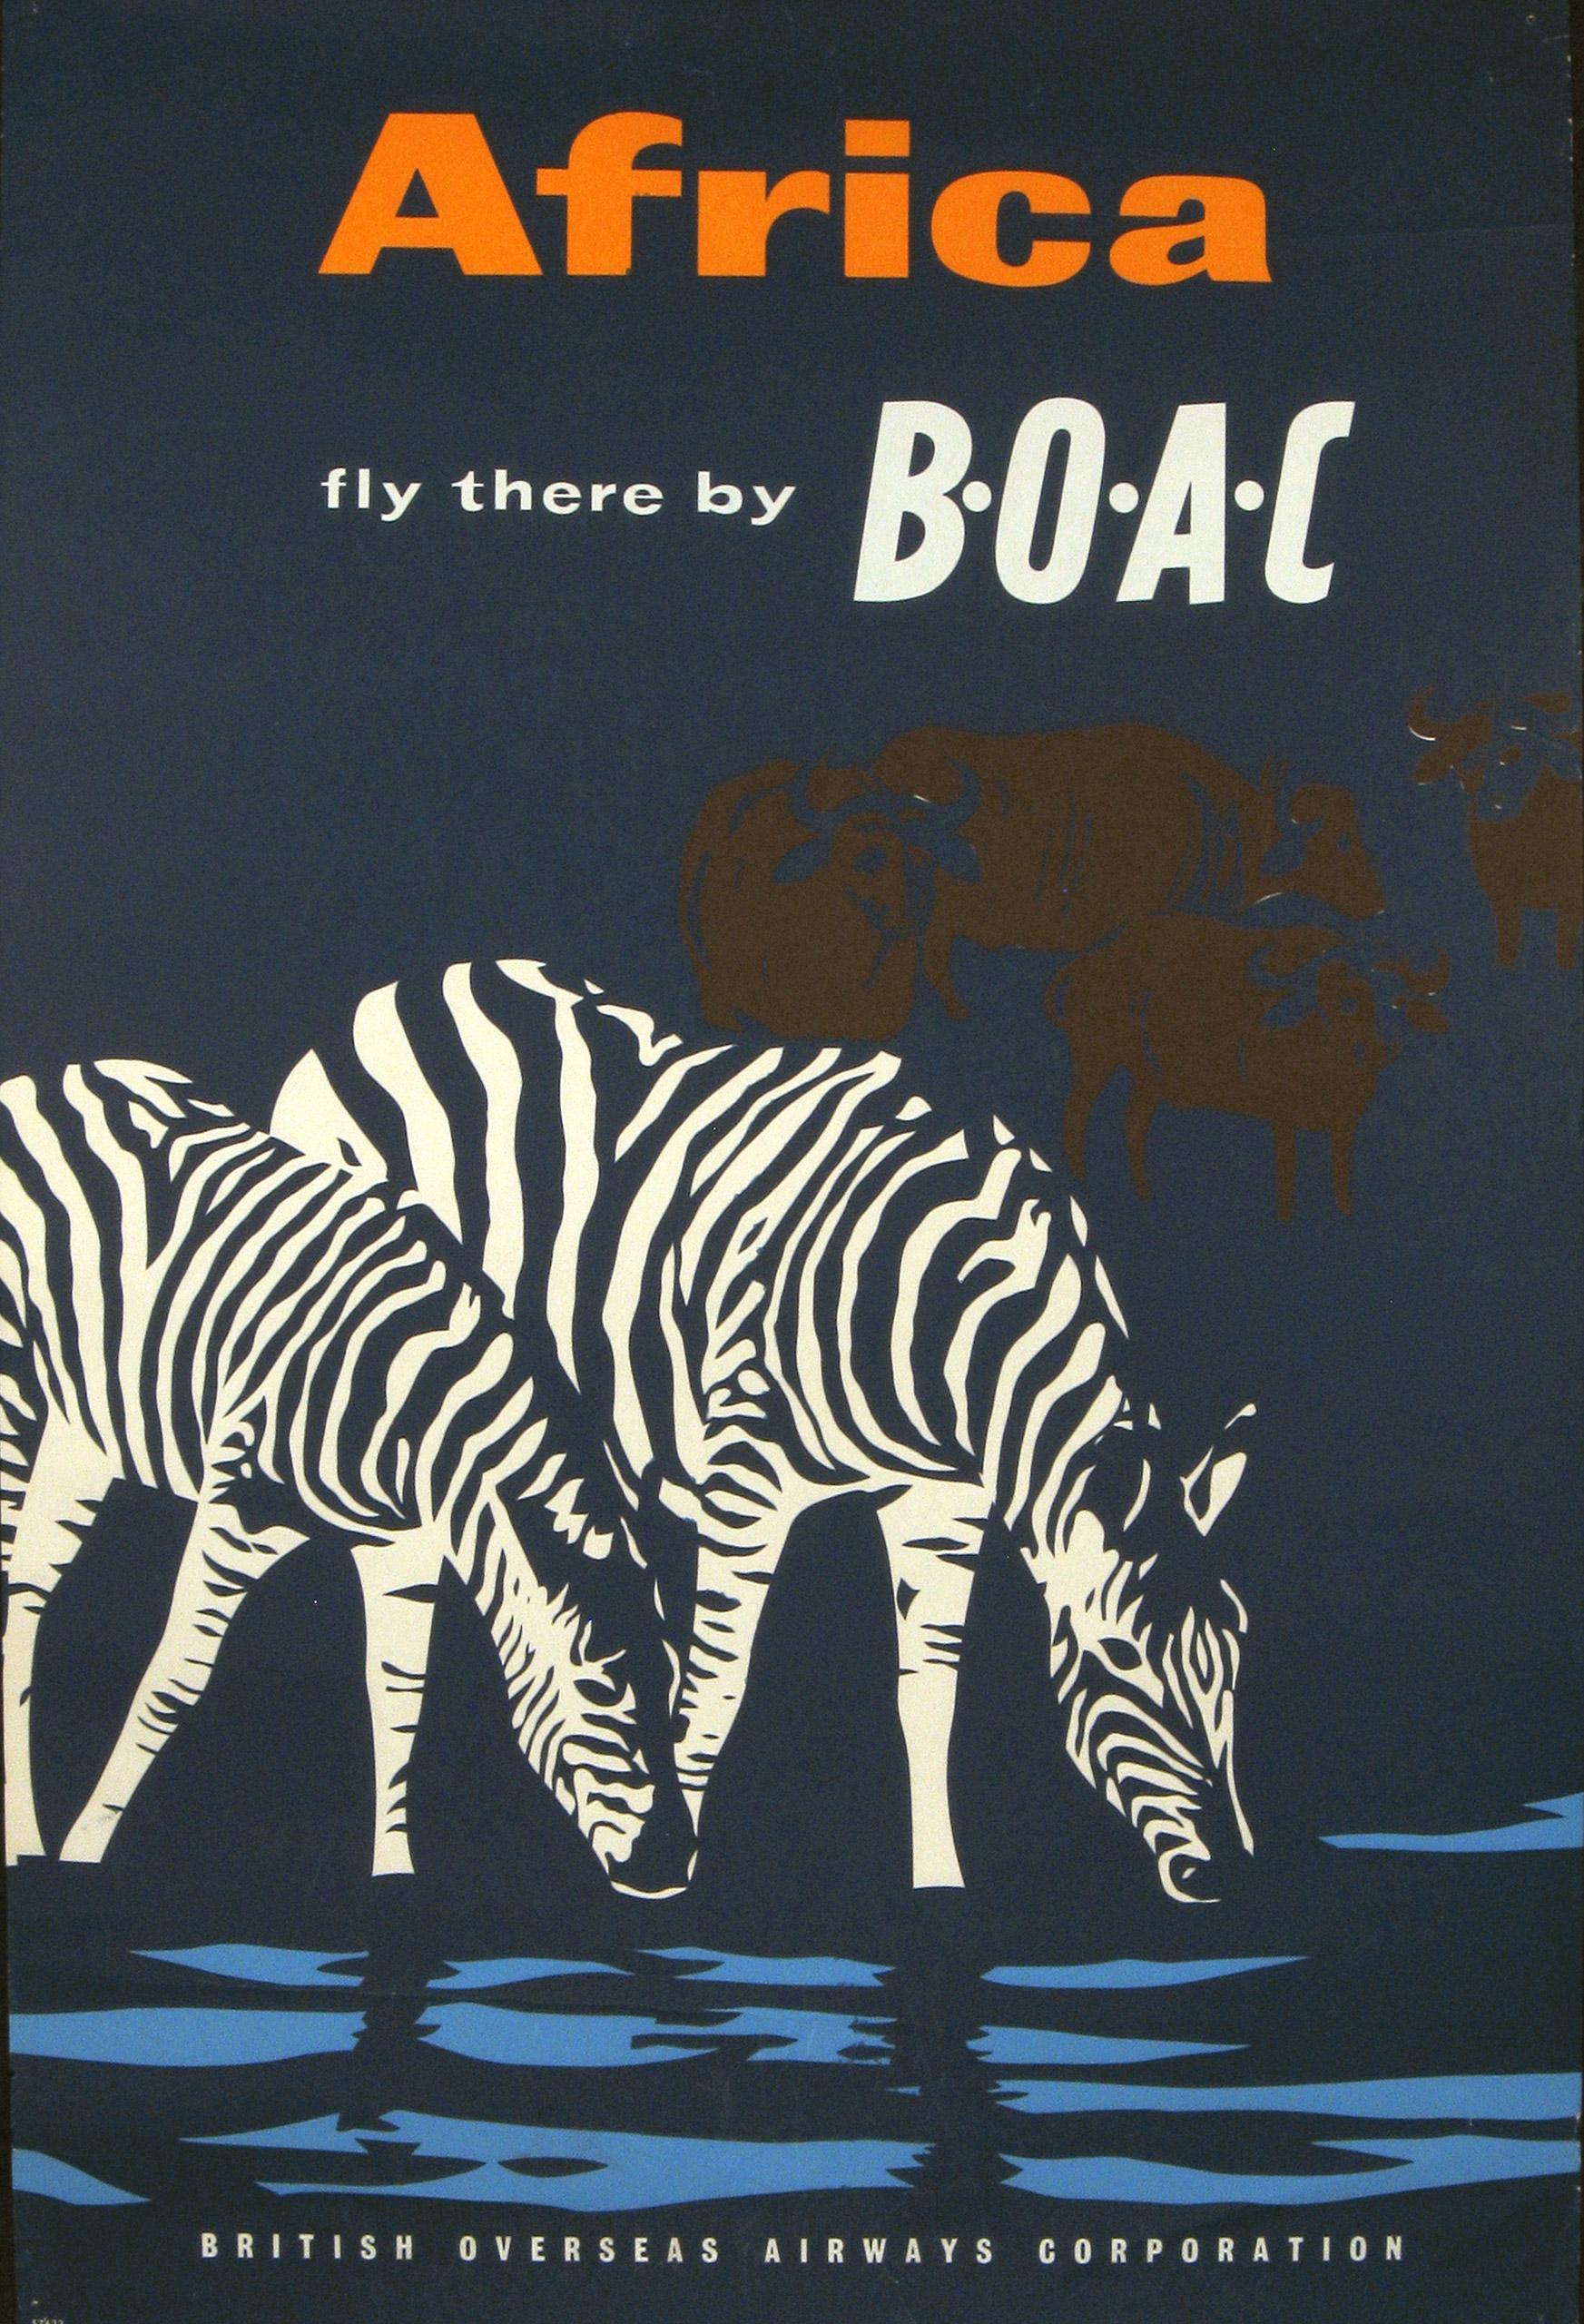 BOAC Africa circa 1960.